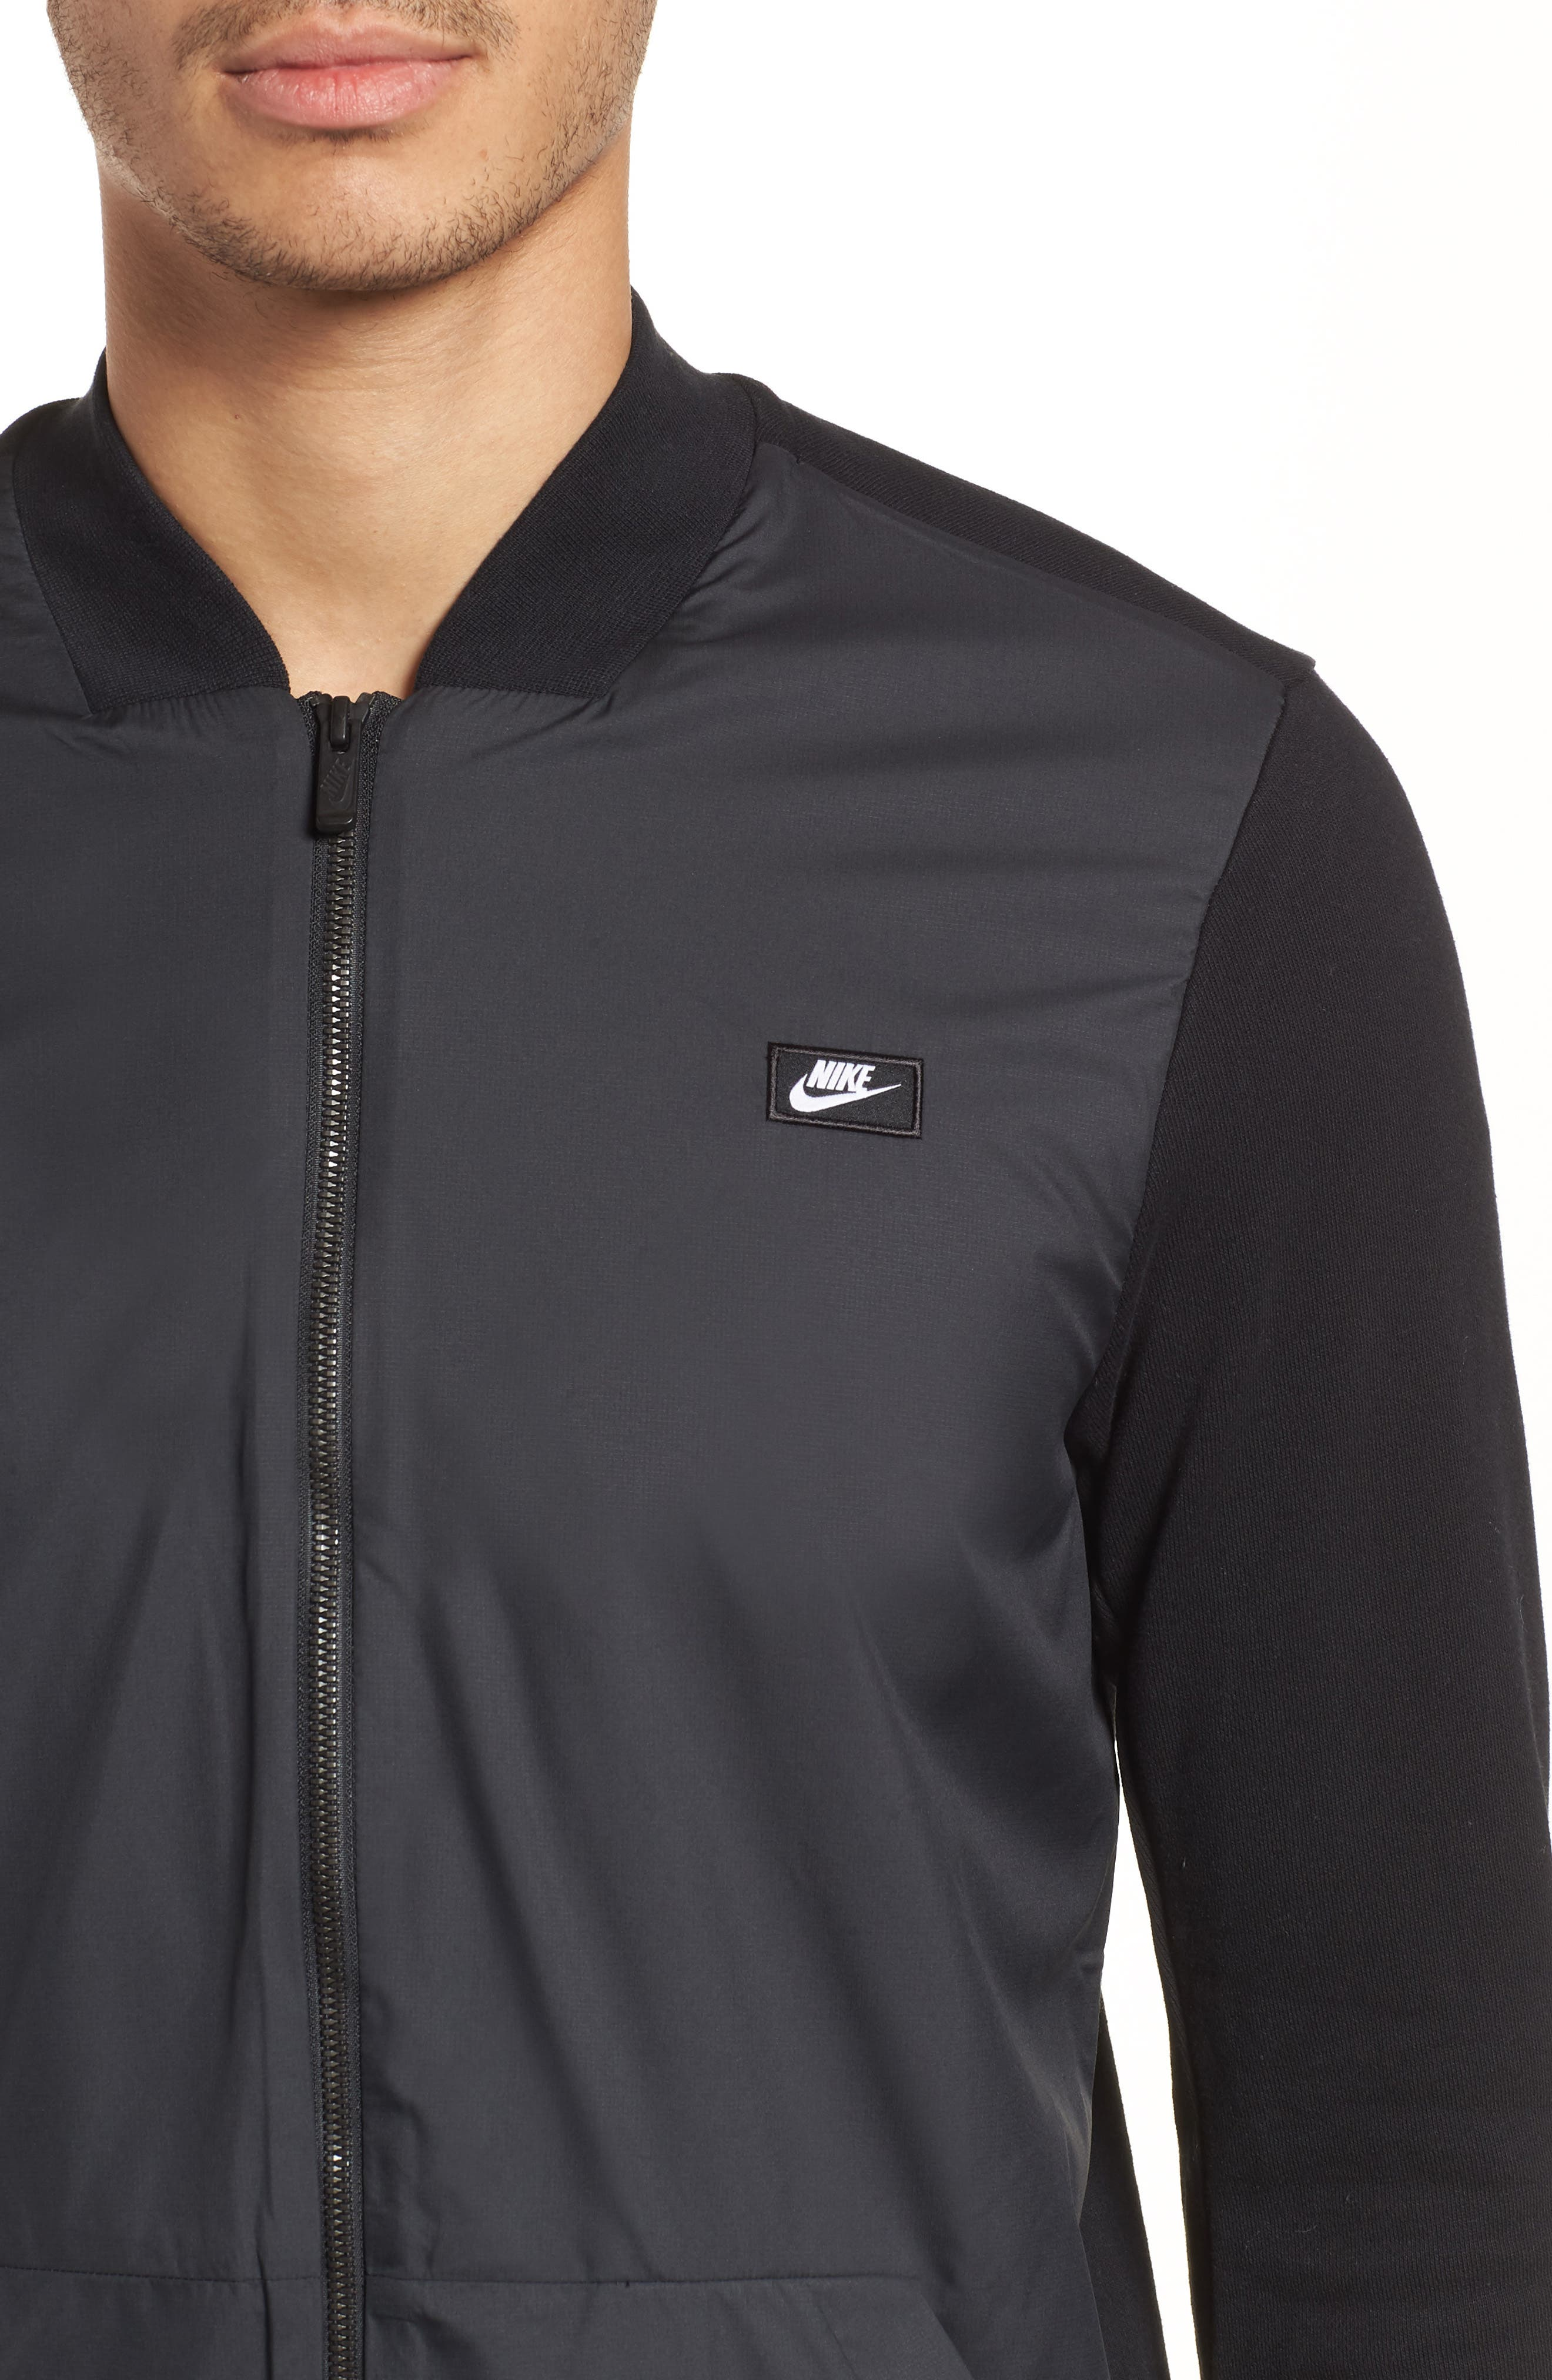 NSW Modern Track Jacket,                             Alternate thumbnail 3, color,                             Black/ Black